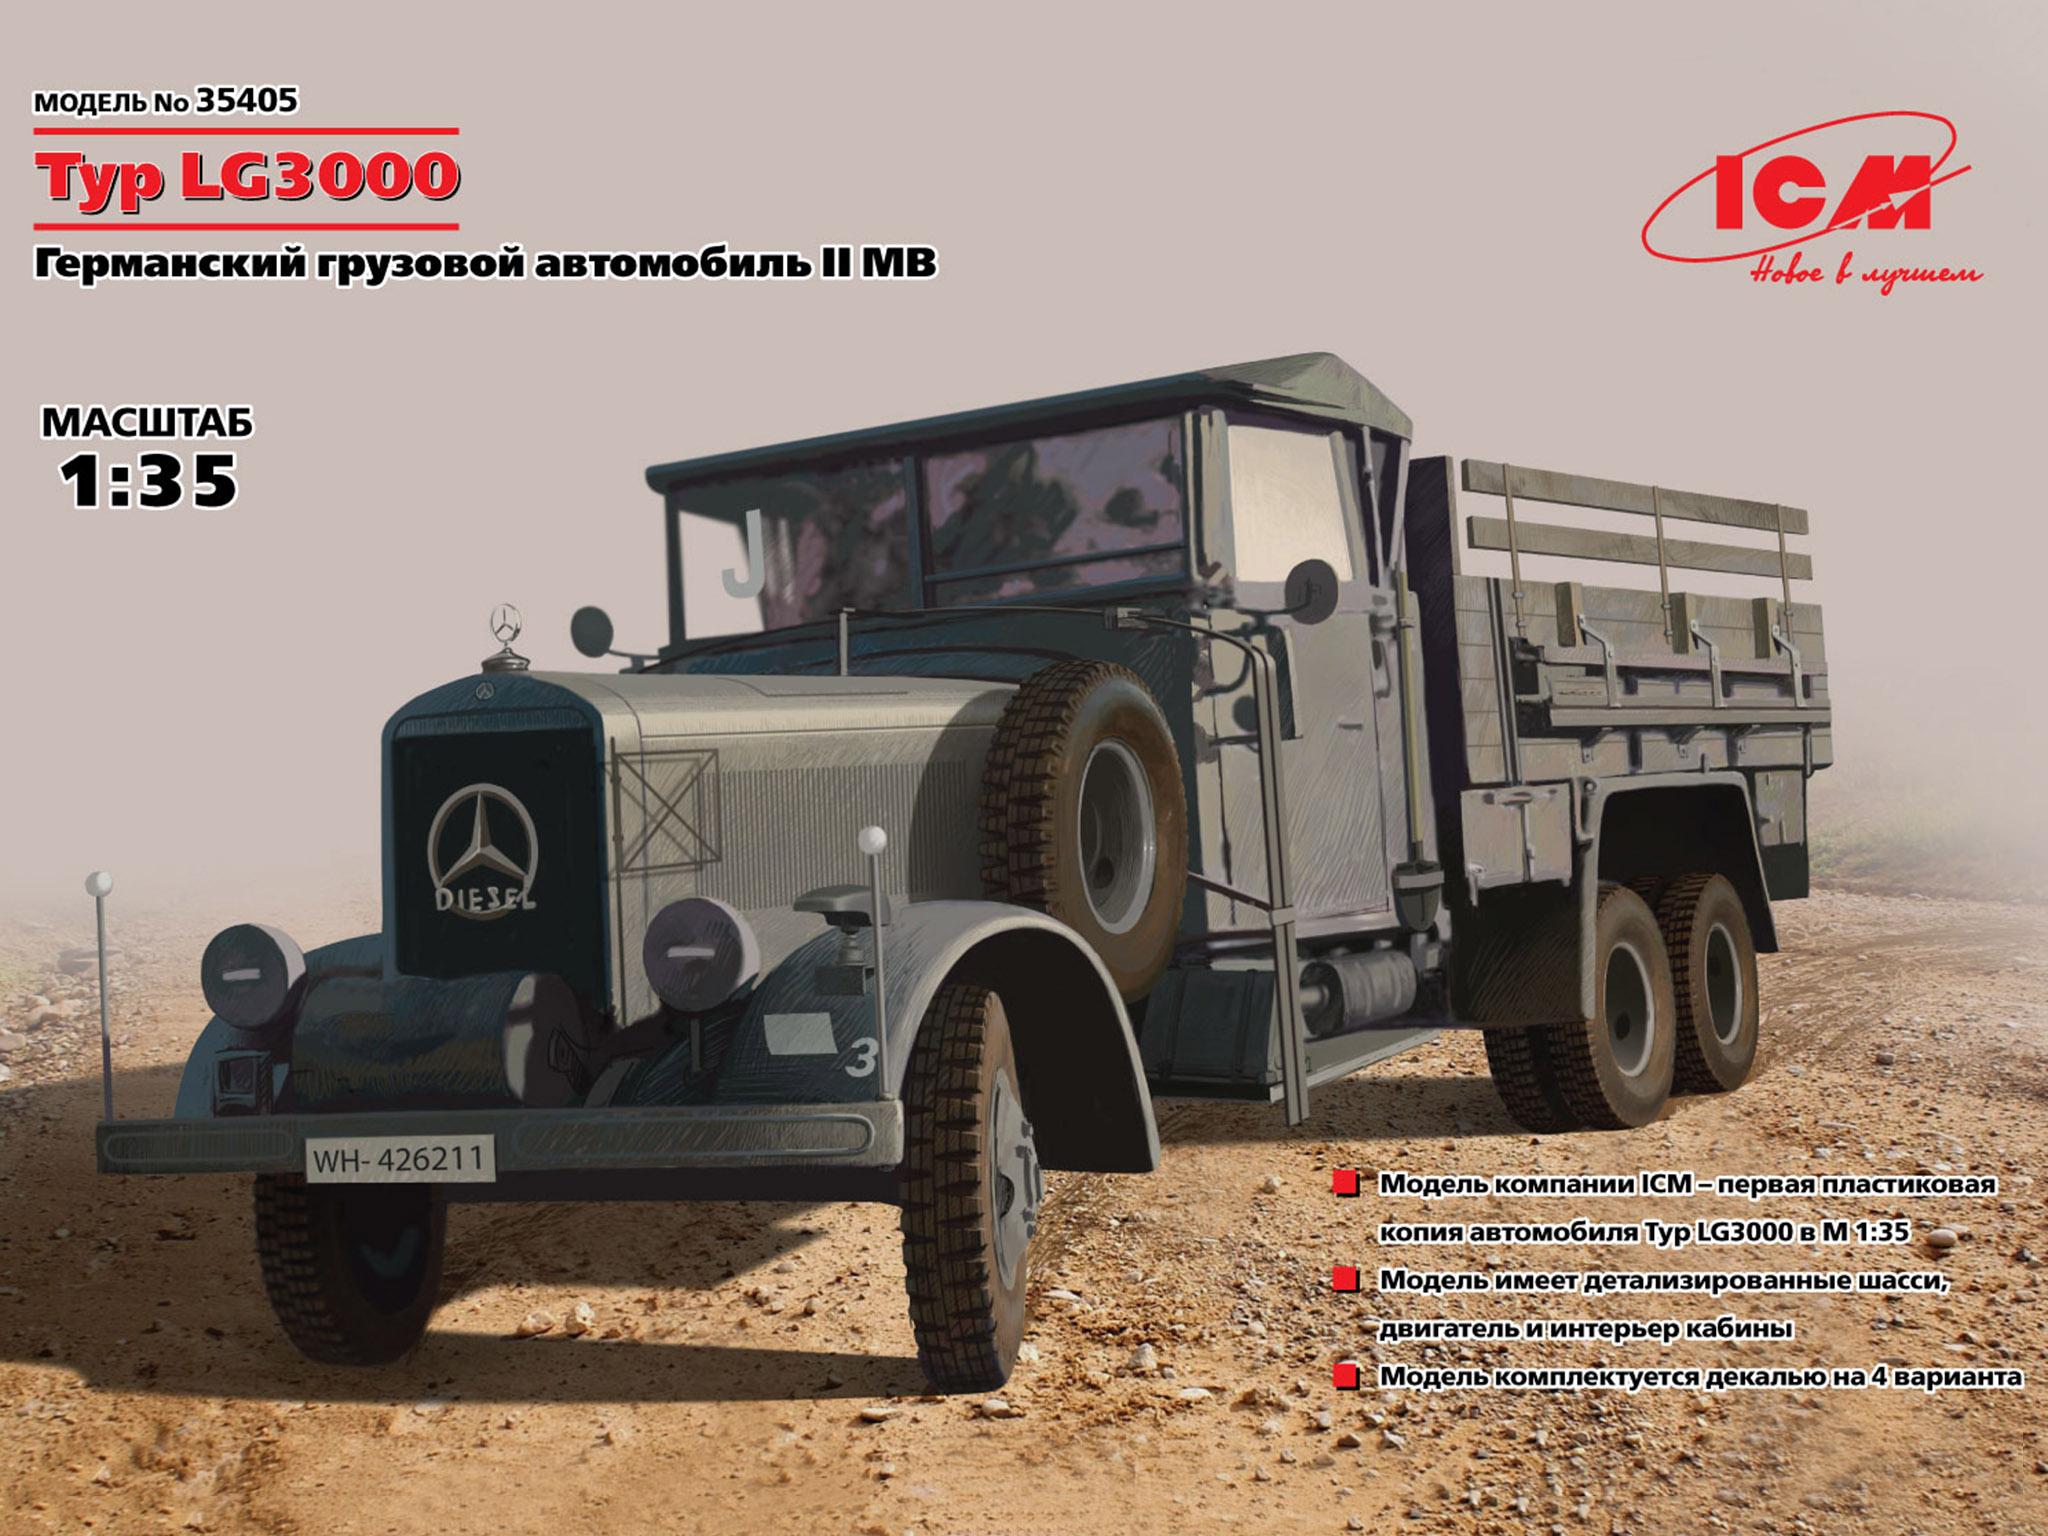 35405_web_ru (2)